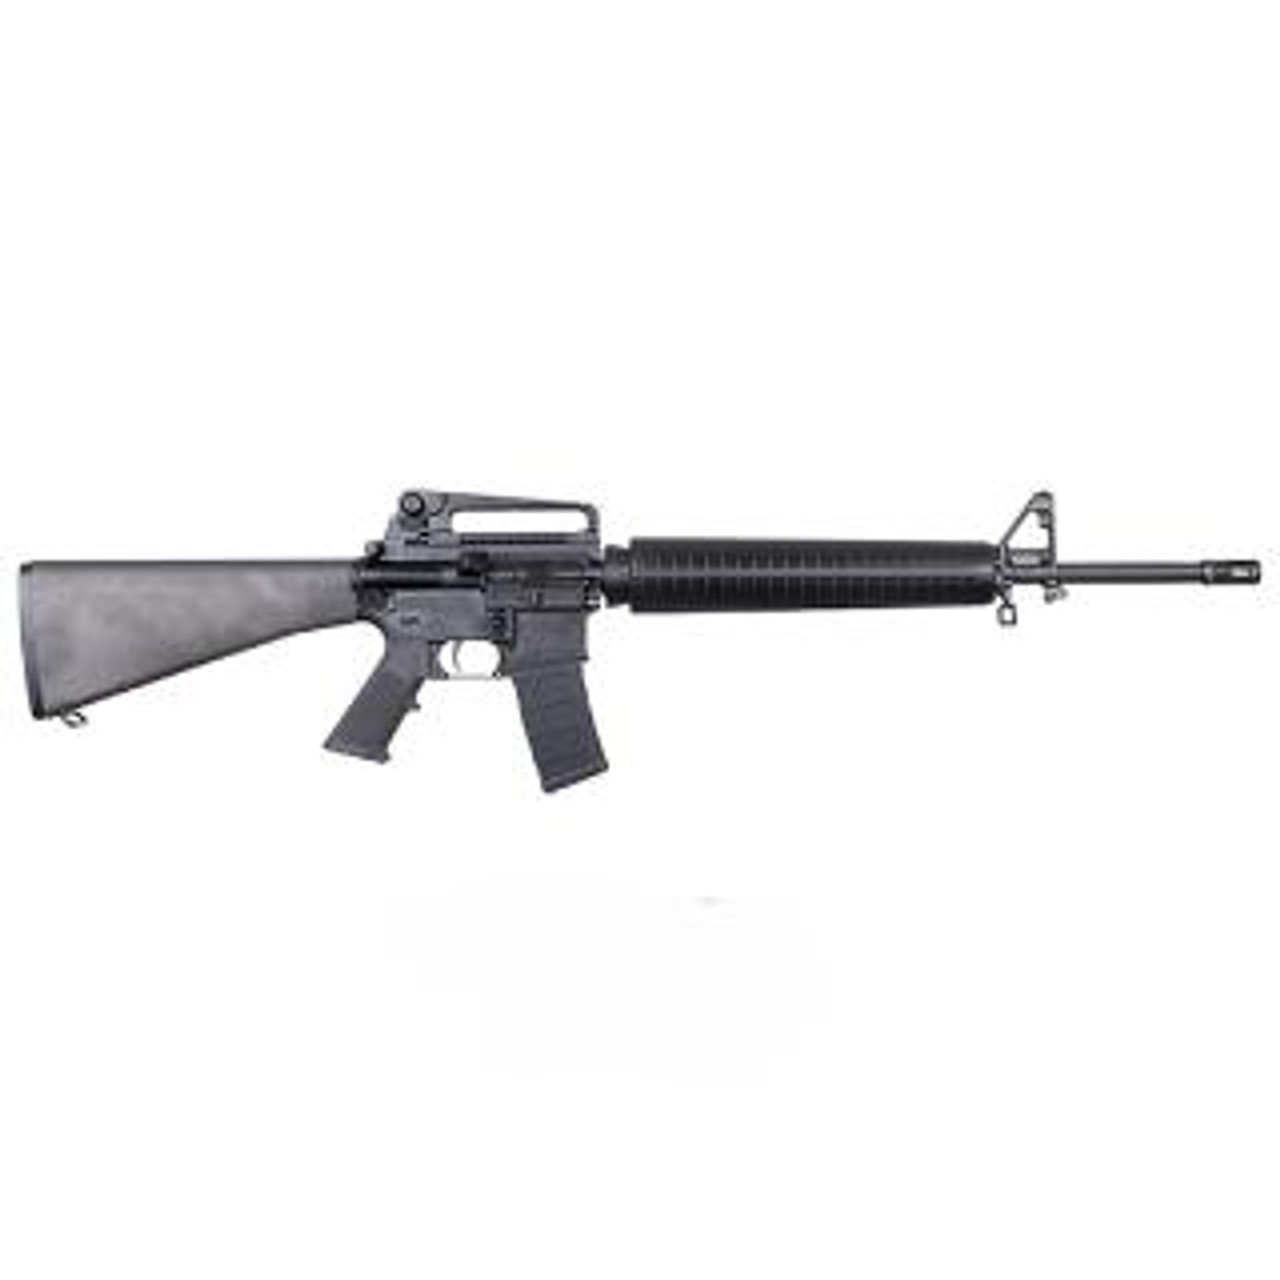 Colt Rifle 20in CALIFORNIA LEGAL - .223/5.56 - Black